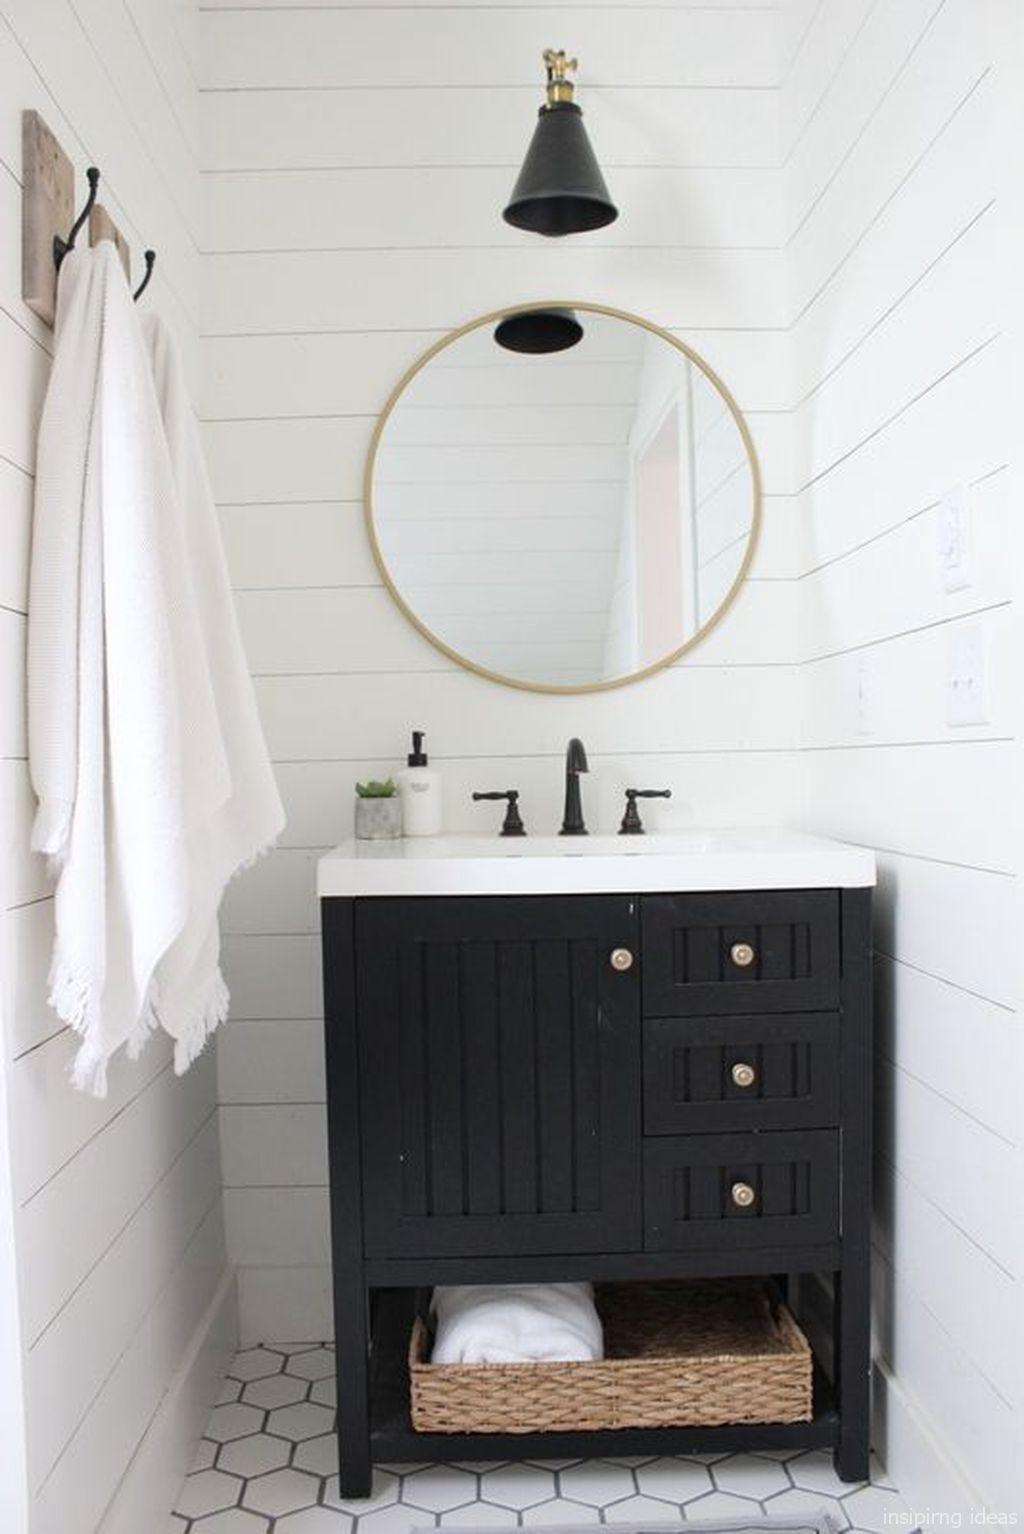 Gorgeous 77 Awesome Modern Farmhouse Bathroom Vanity Ideas Https Roomaholic Com 3 Bathroom Vanity Designs Modern Farmhouse Bathroom Farmhouse Bathroom Vanity